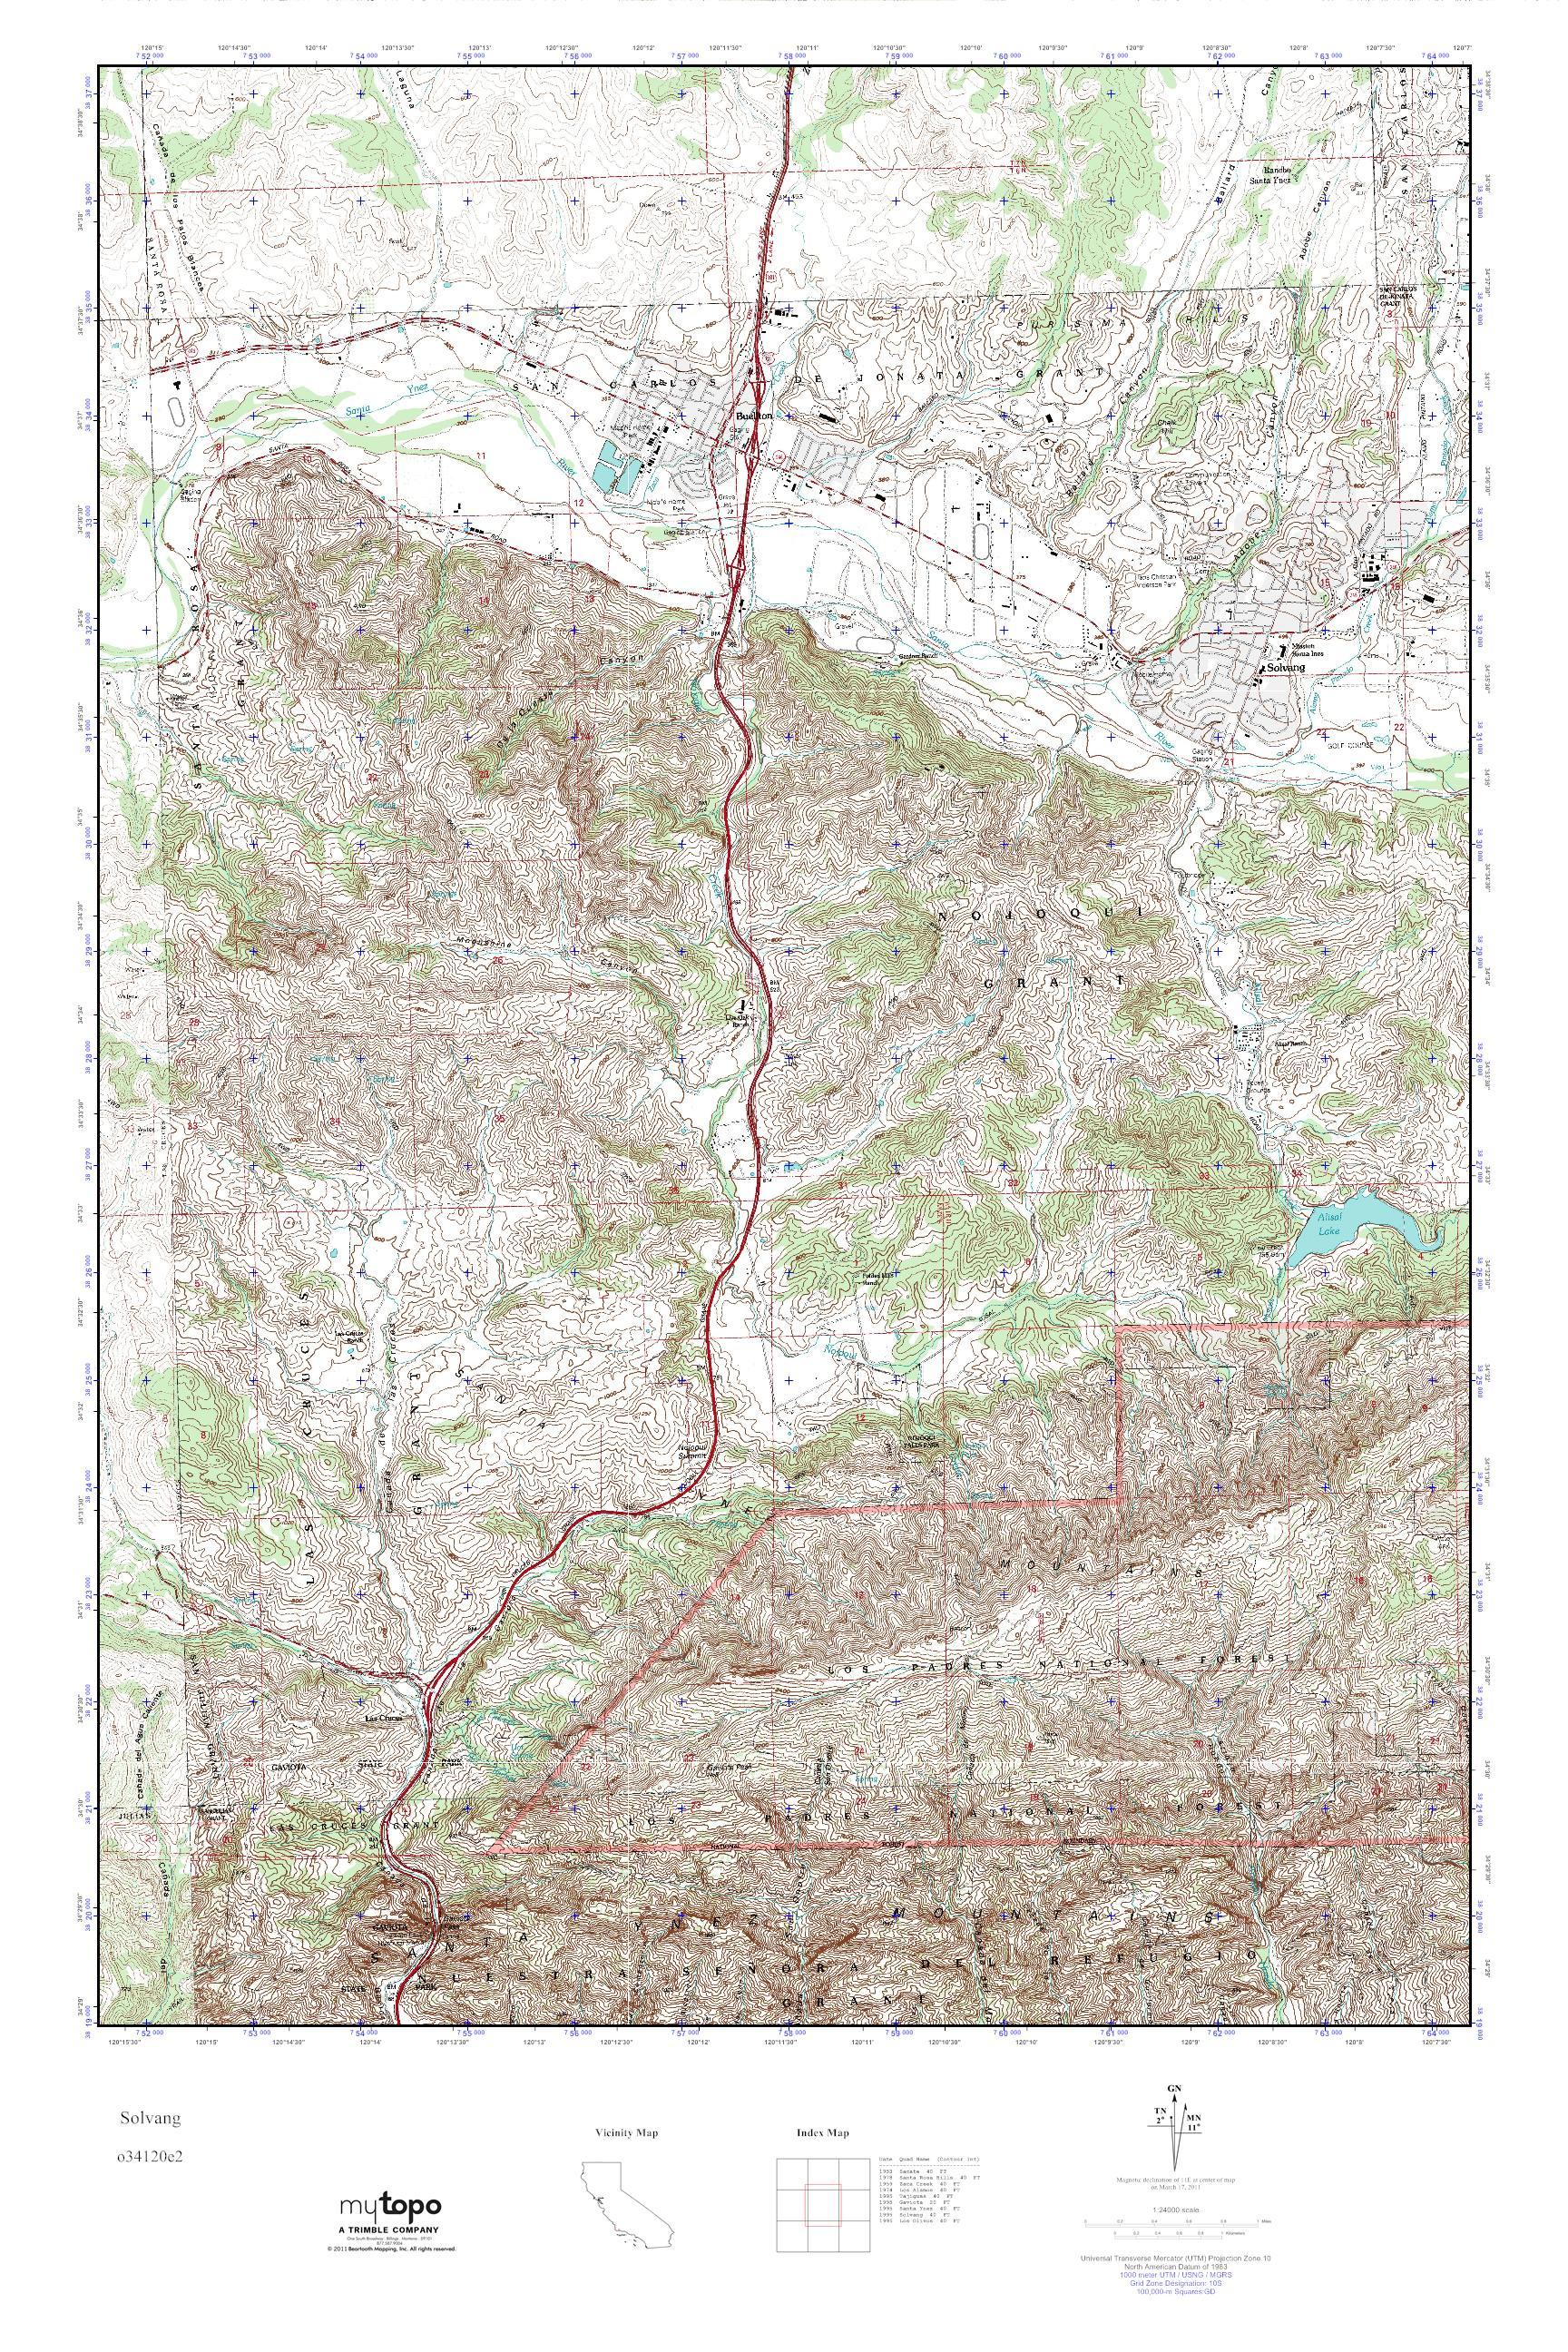 Mytopo Solvang California Usgs Quad Topo Map